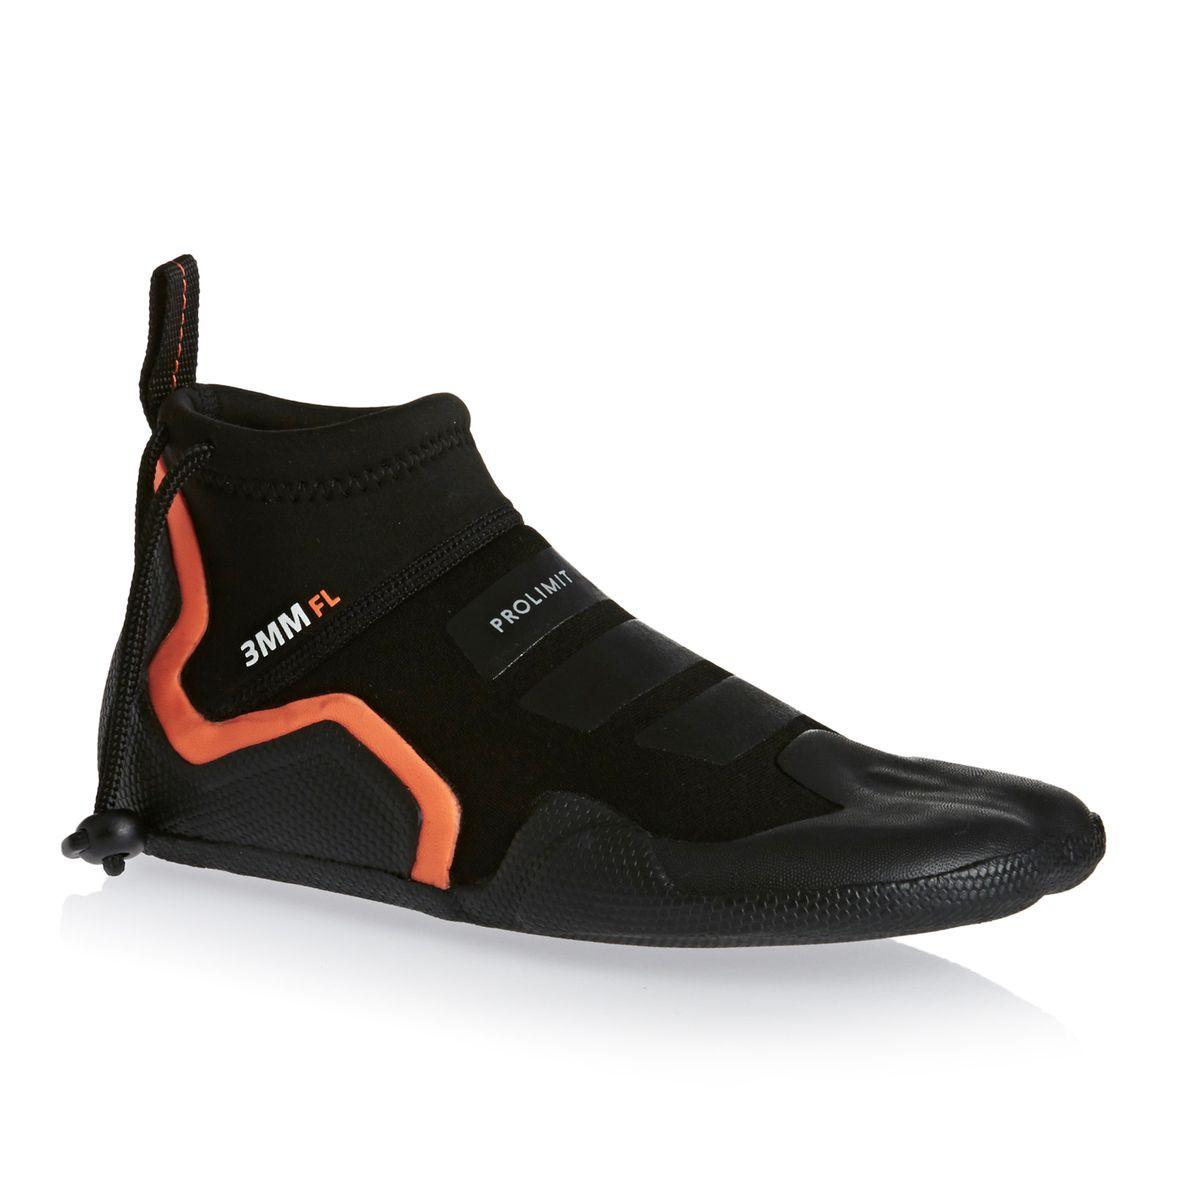 Prolimit Pl Evo Shoe 3mm 2017 Round Toe Wetsuit Boots - Black/ Orange